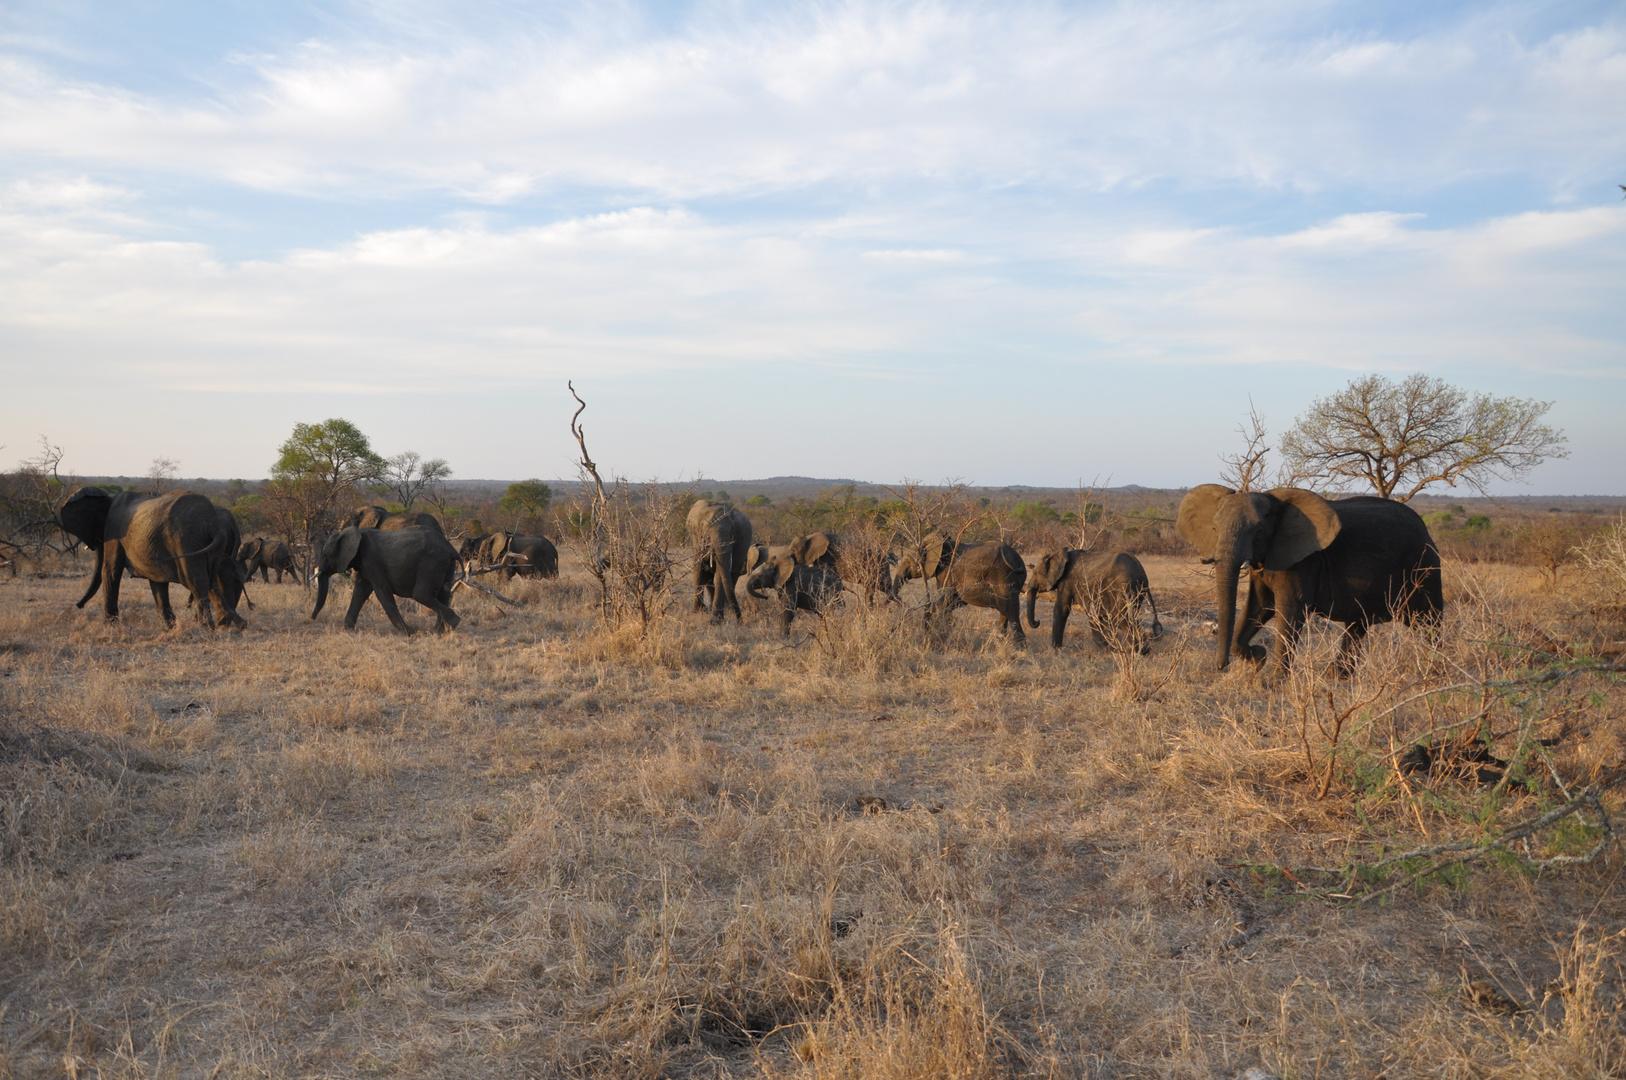 Elefanten im Krüger Nationalpark (Südafrika)